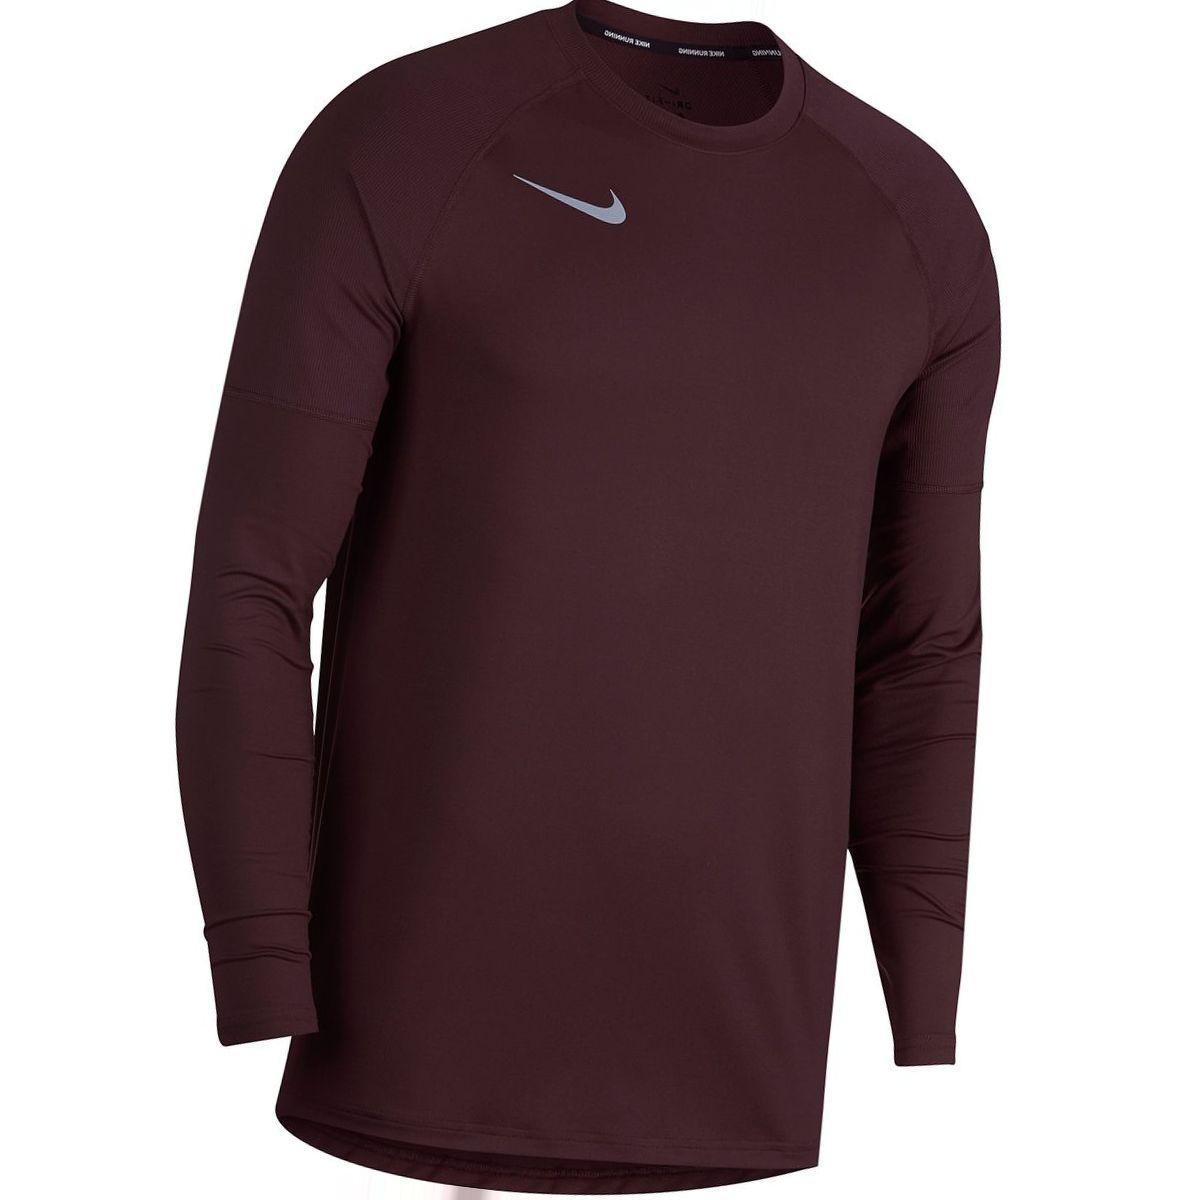 Nike Dry Element Crew Shirt - Men's